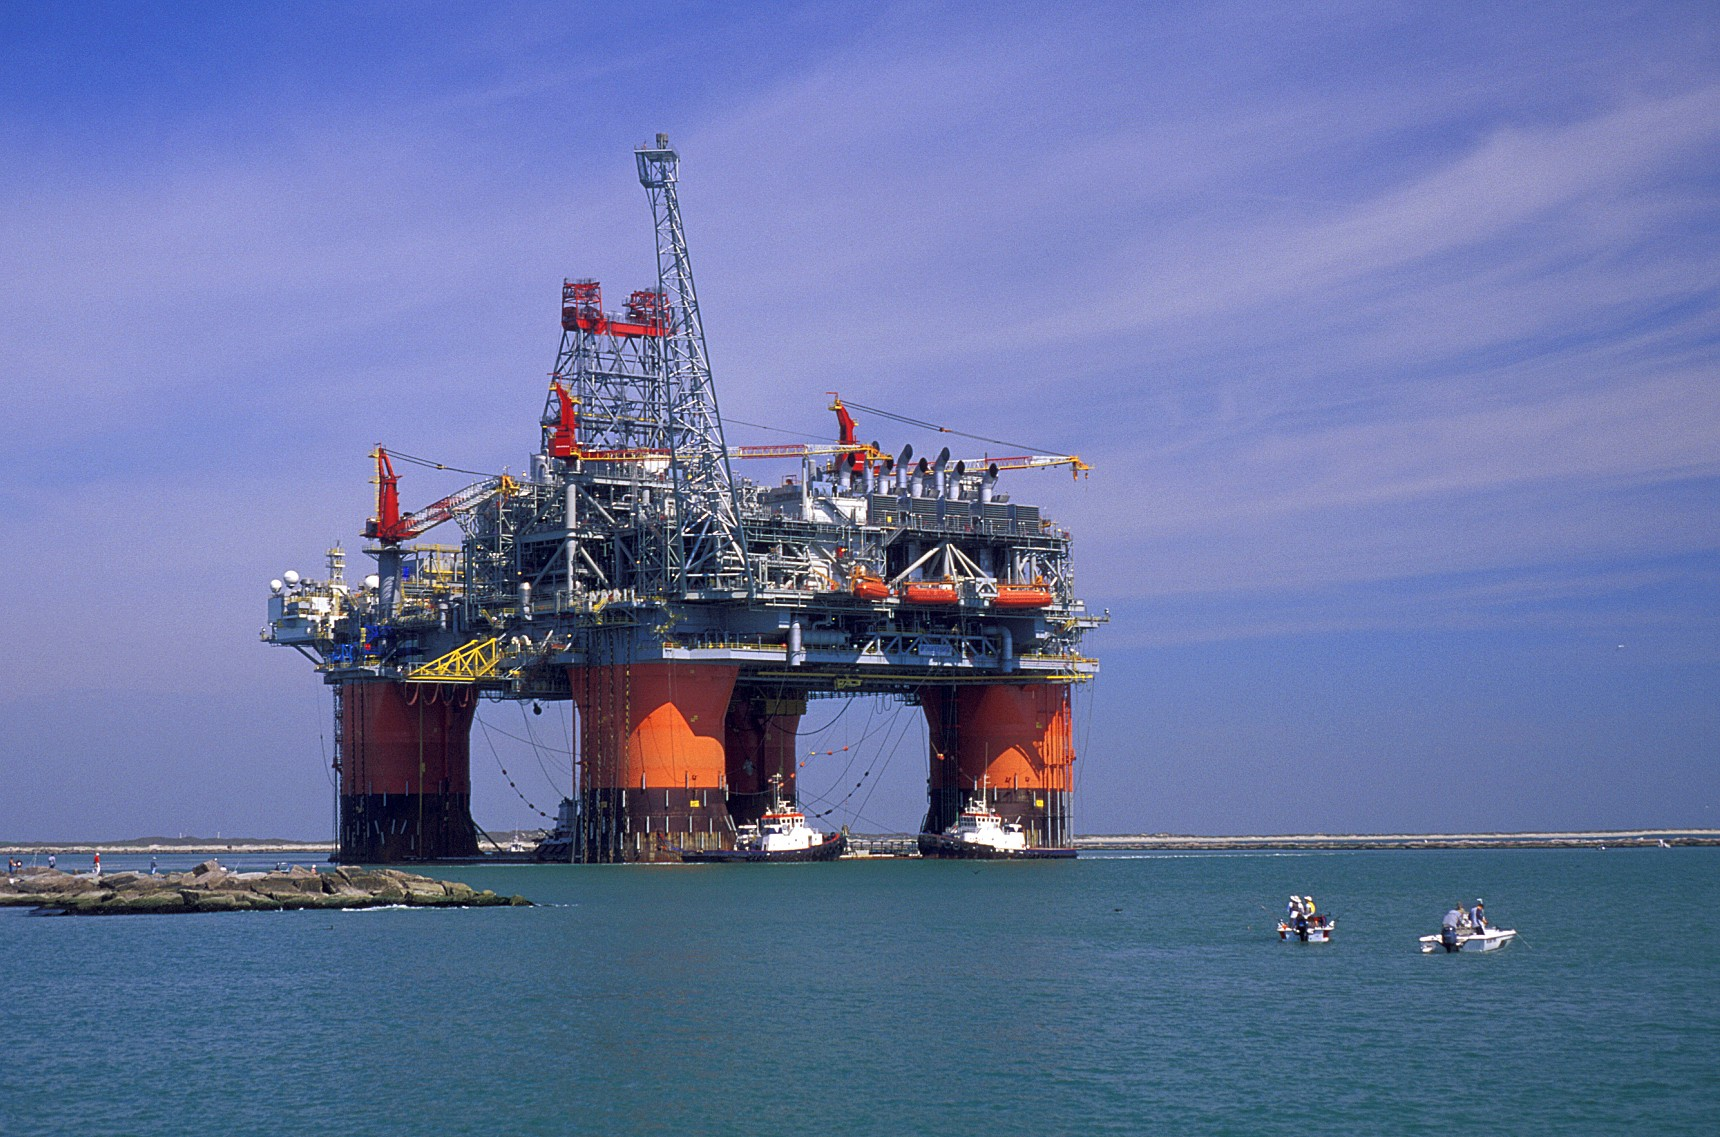 MECEI OIL & GAS WORLD MAGAZINE - مجلة عالم النفط والغاز